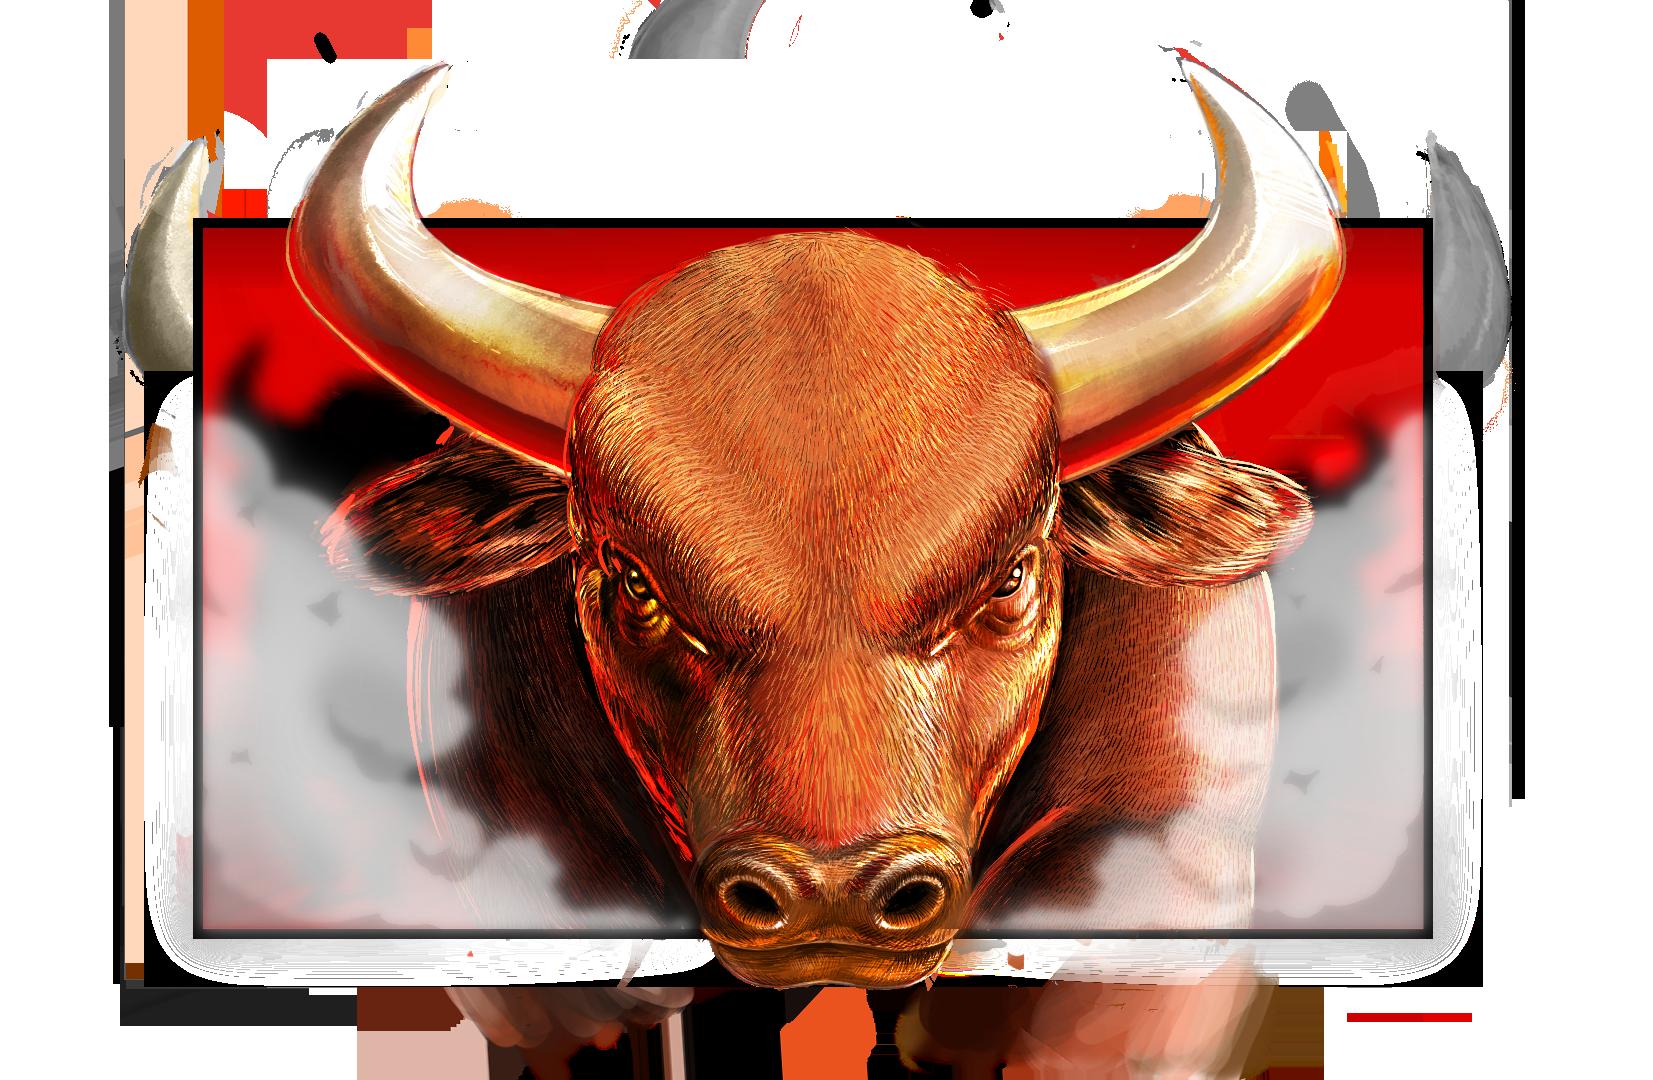 jackpotstampede_bull_clouds.png